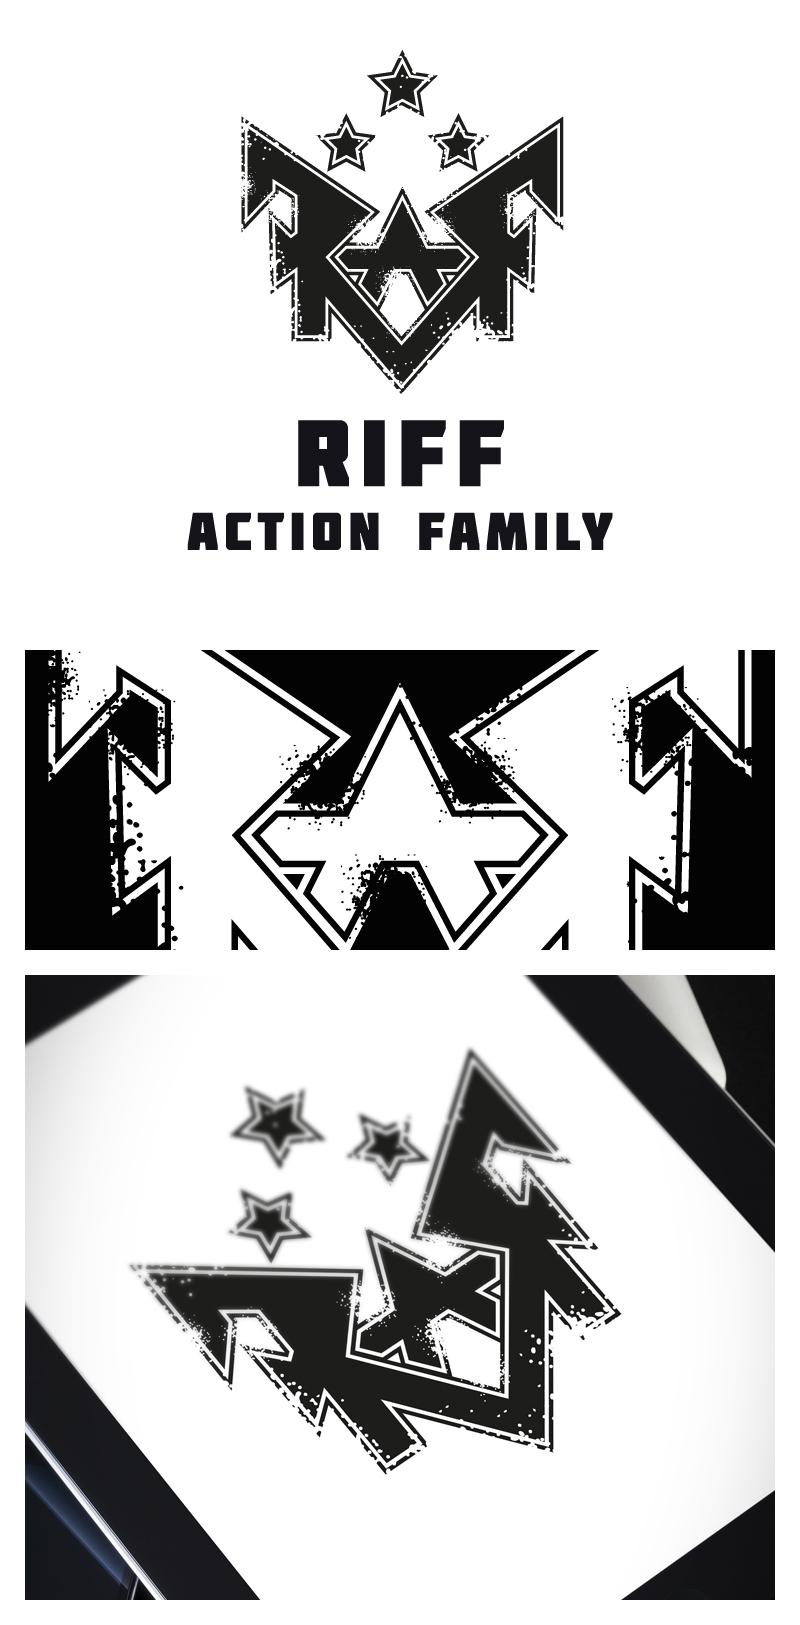 R.A.F. логотип для рок-группы